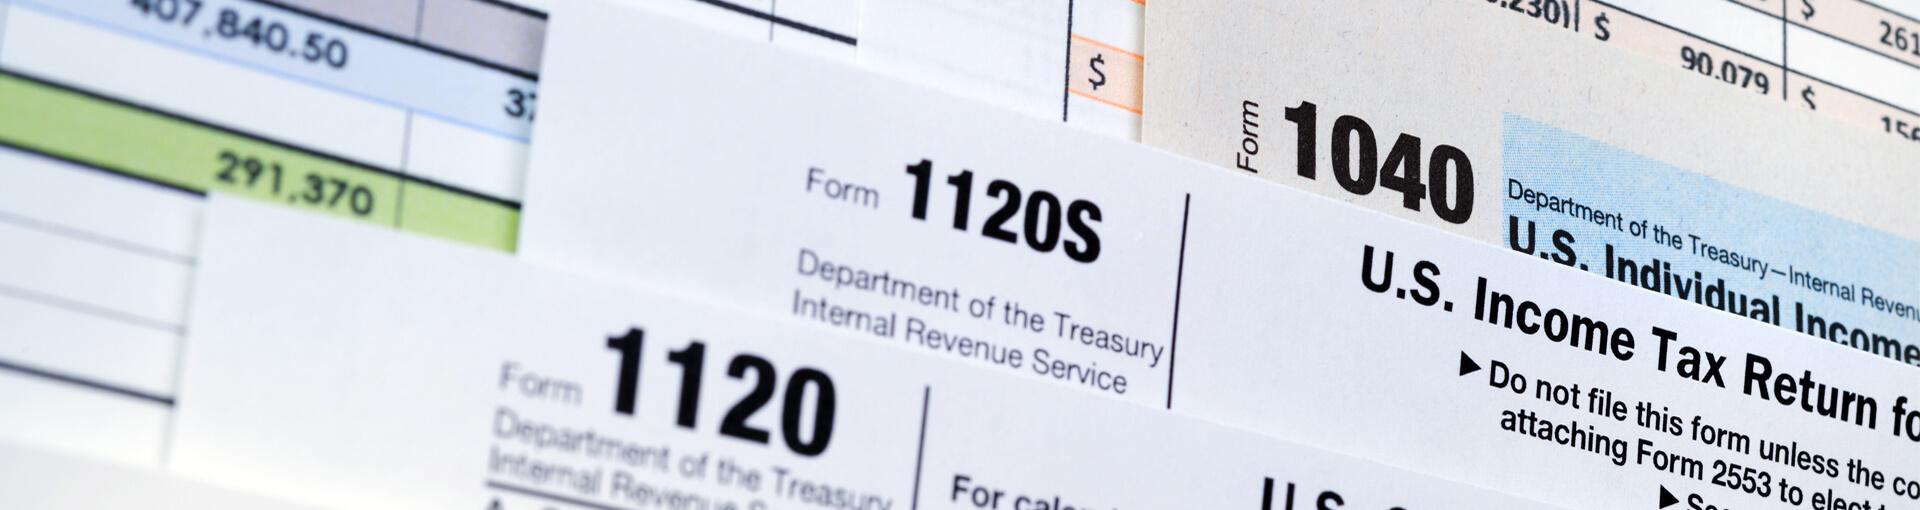 CPA Tax Services